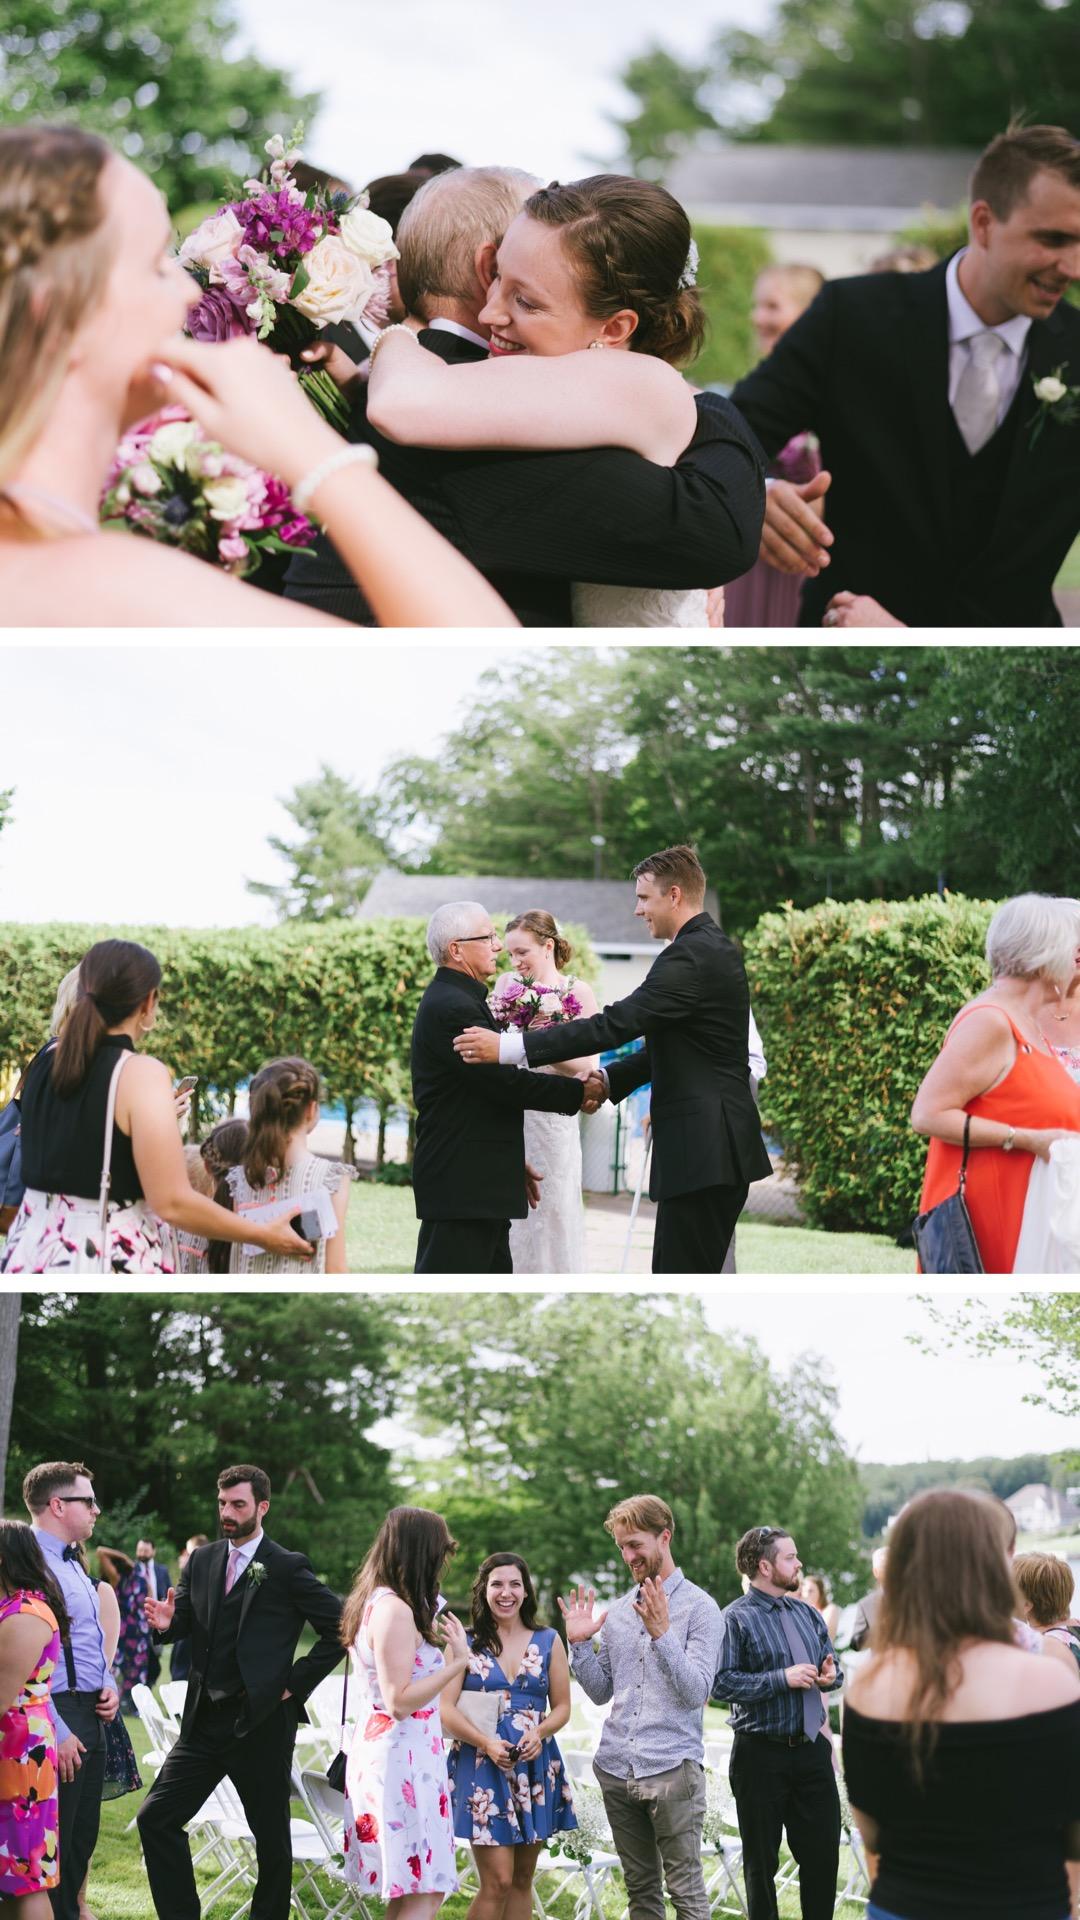 Martina & Scott Halifax Wedding Photographer - Sinead Dubeau Photography 16